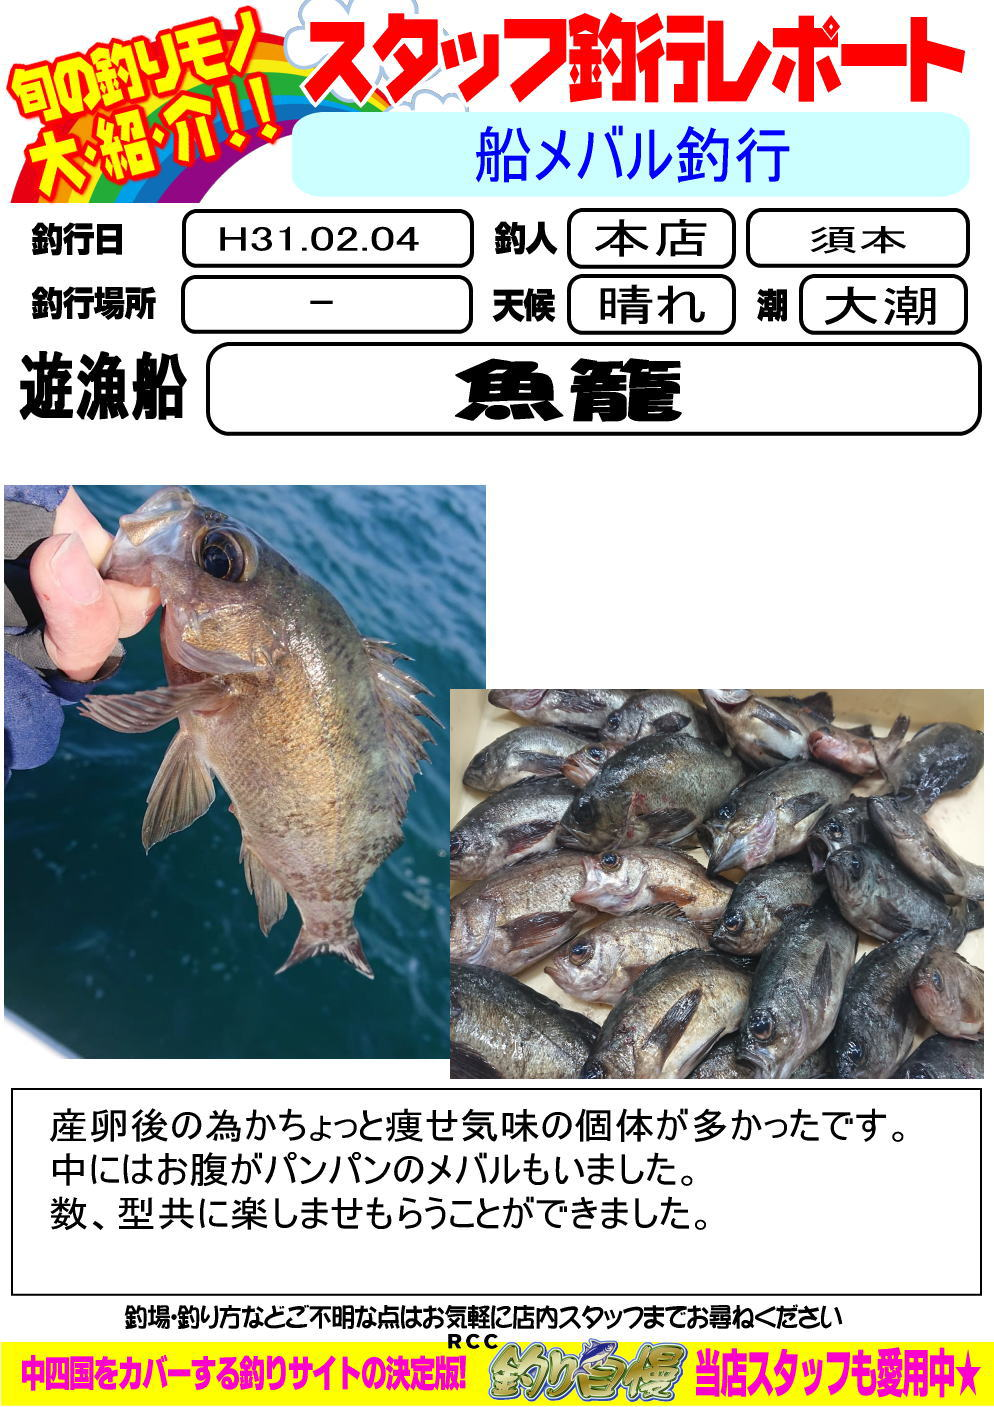 http://www.e-angle.co.jp/shop/blog/H31.02.05.jpg